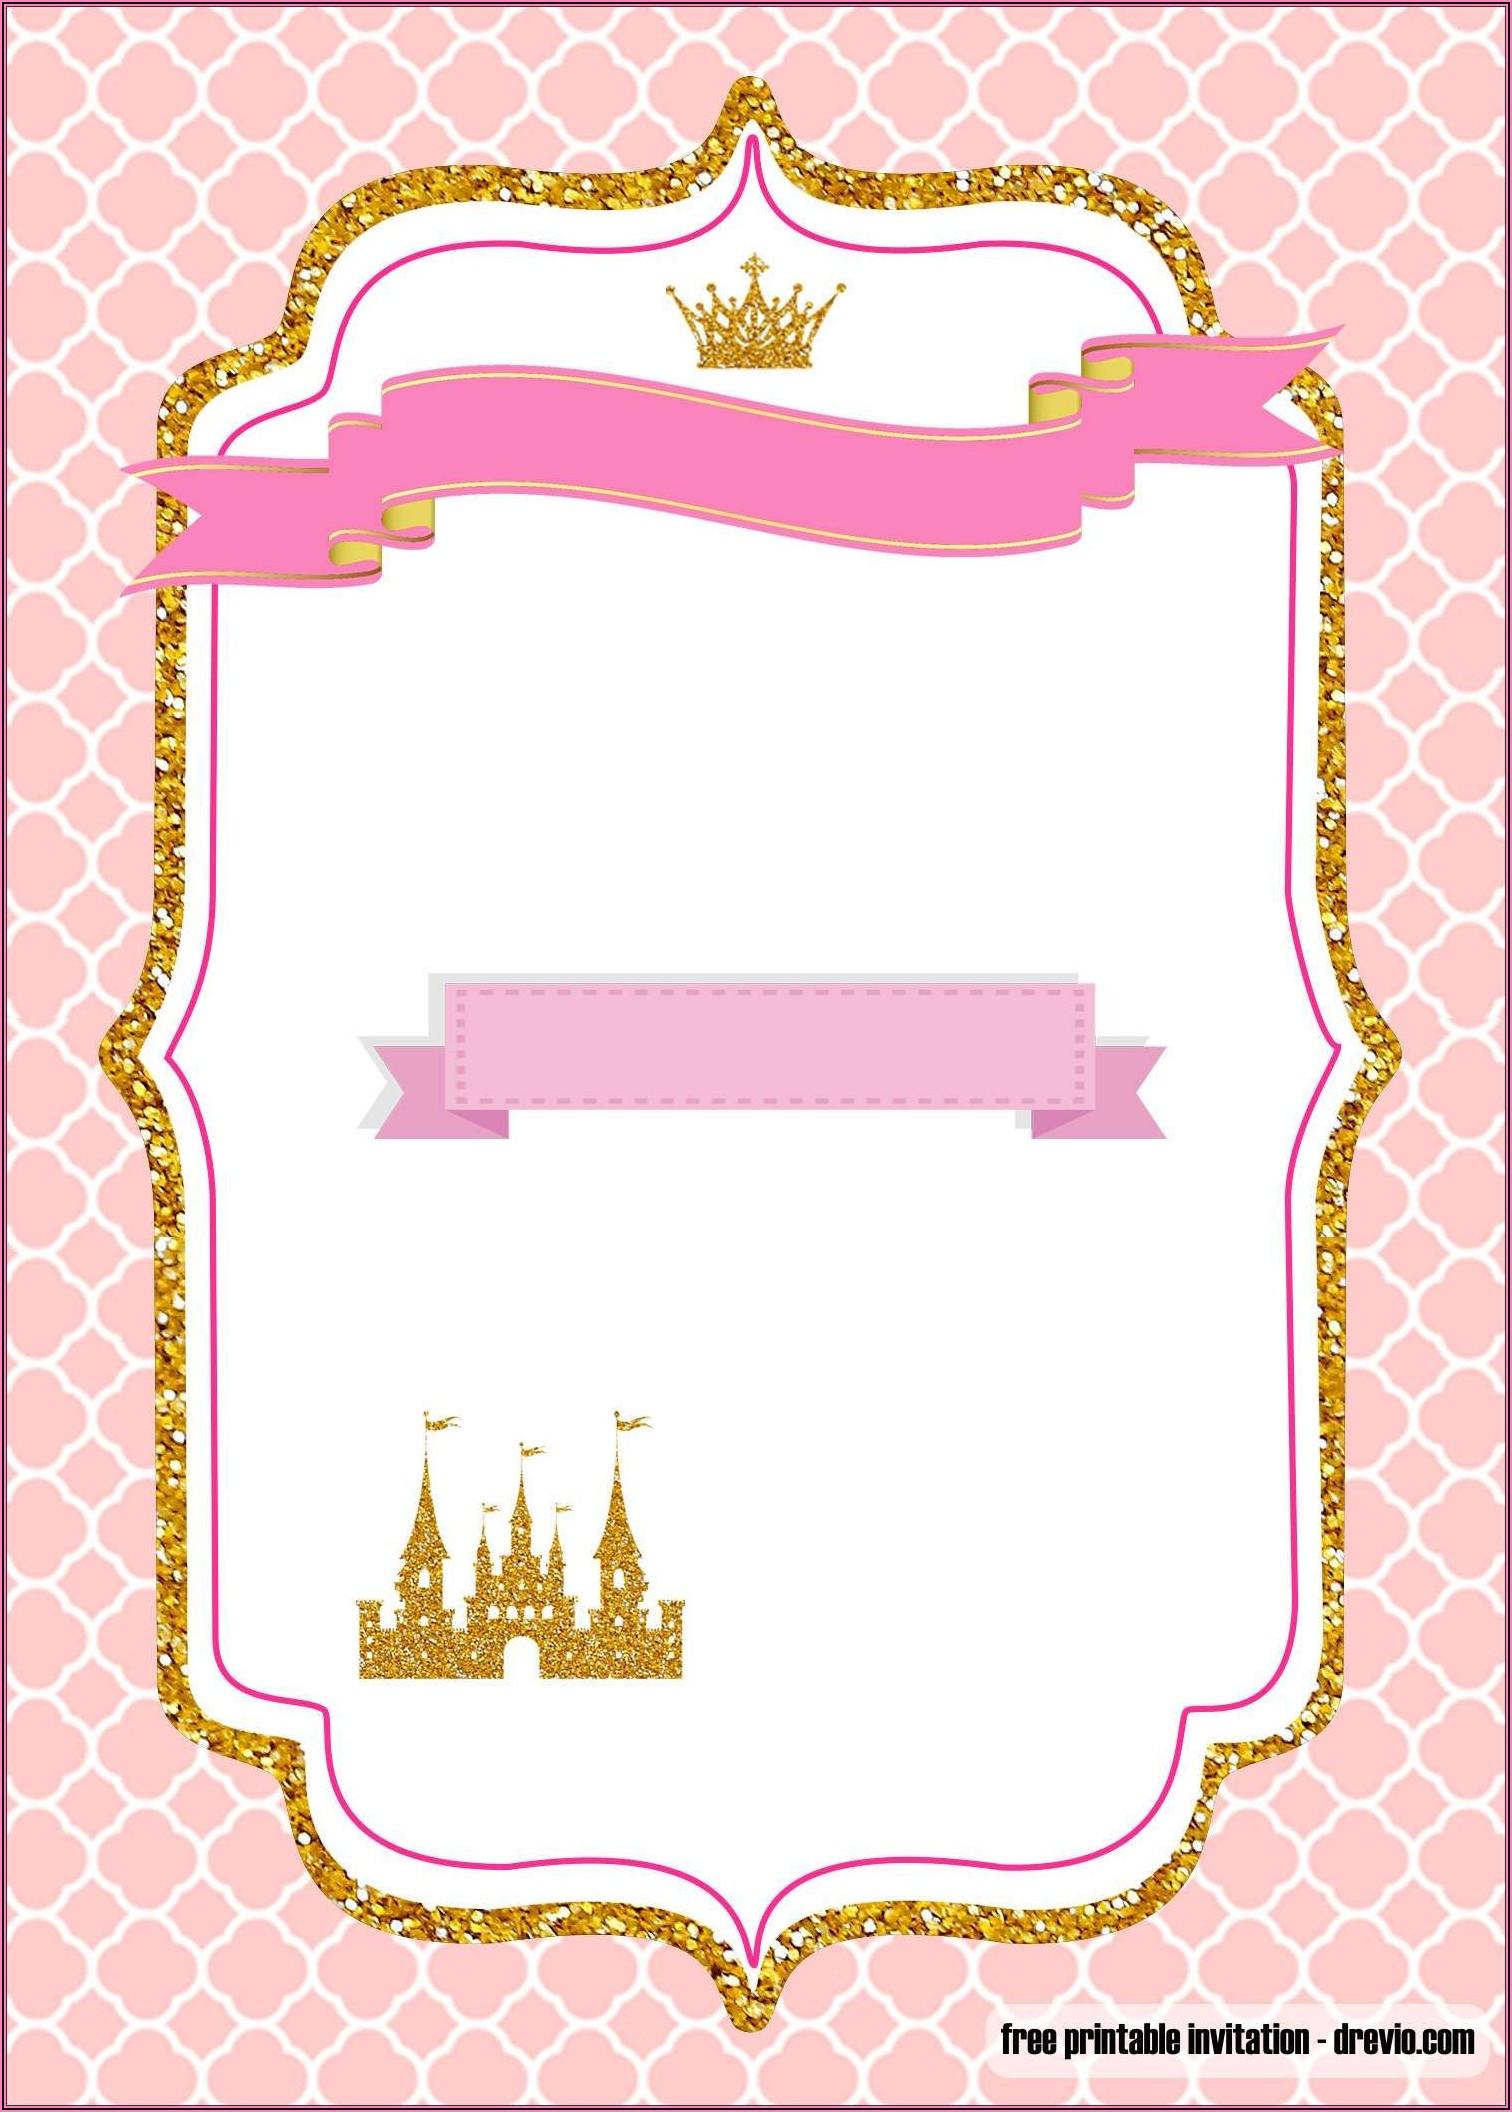 7th Birthday Invitation Background Templates